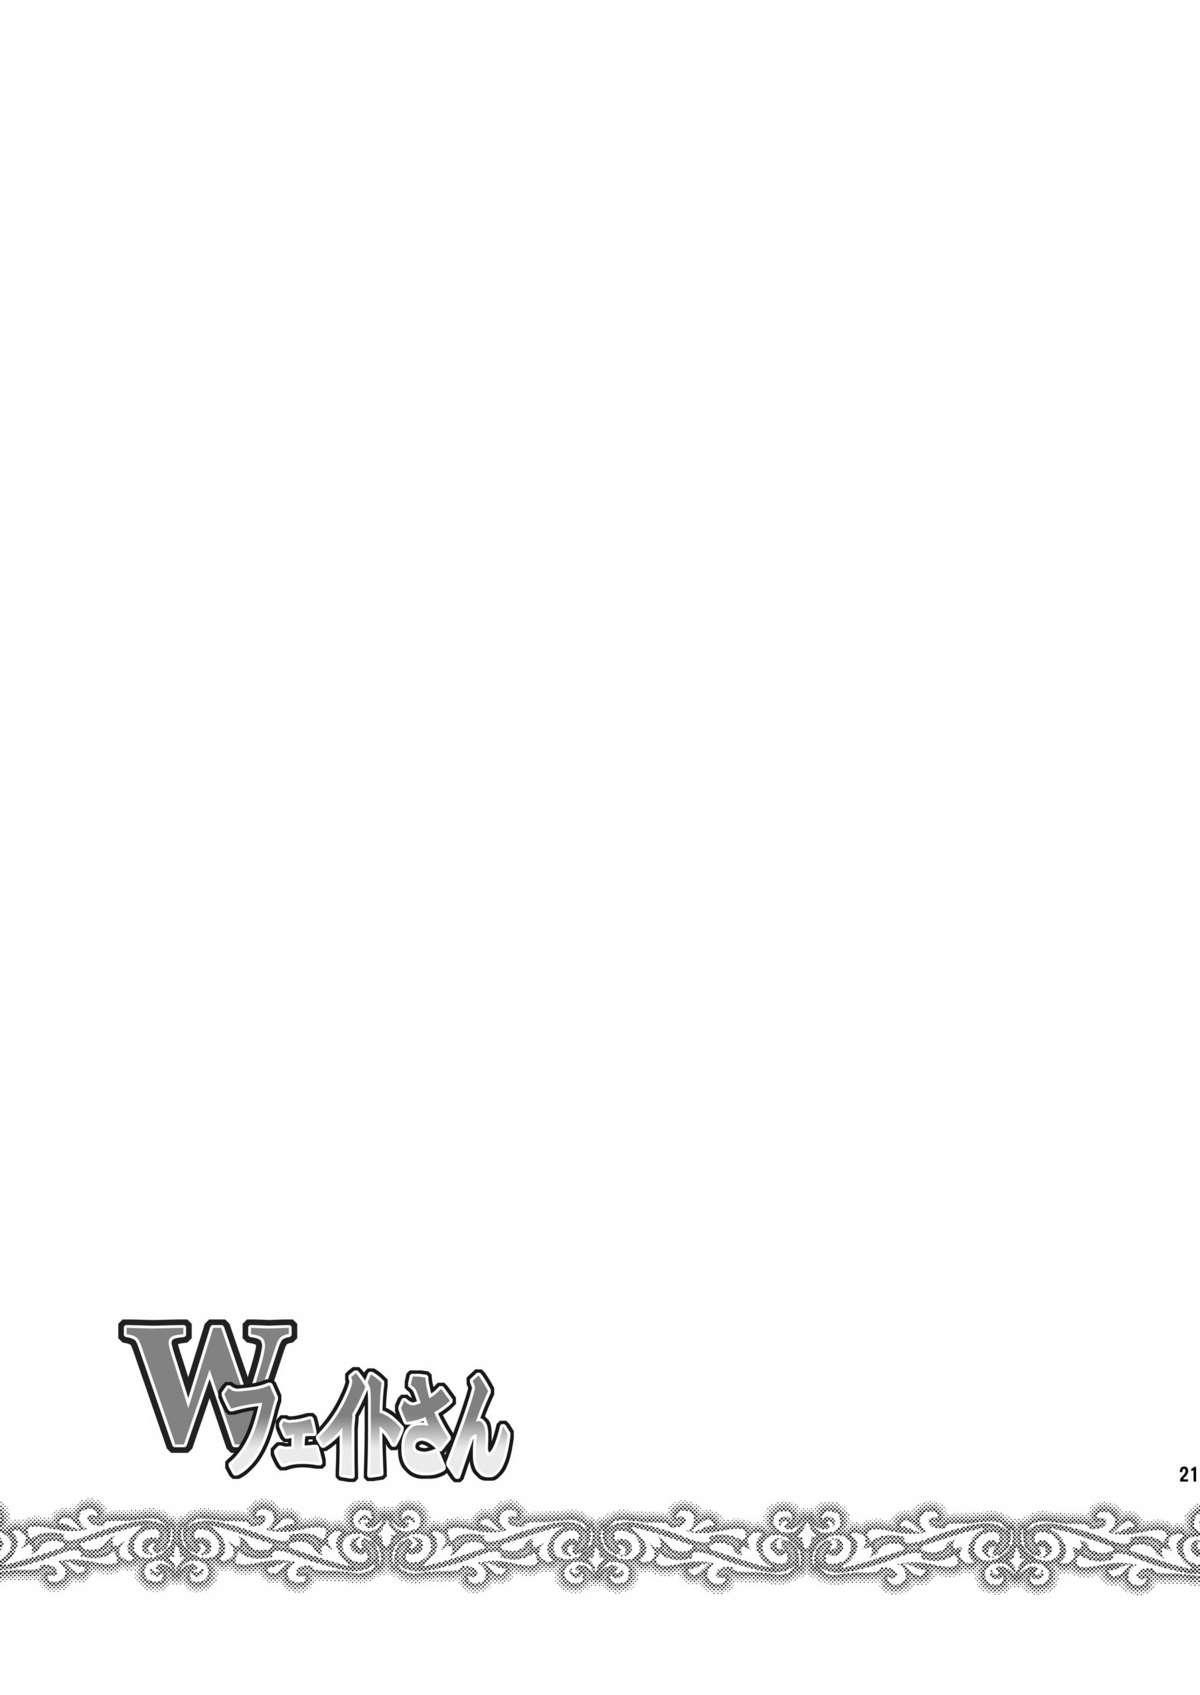 W Fate-san 20